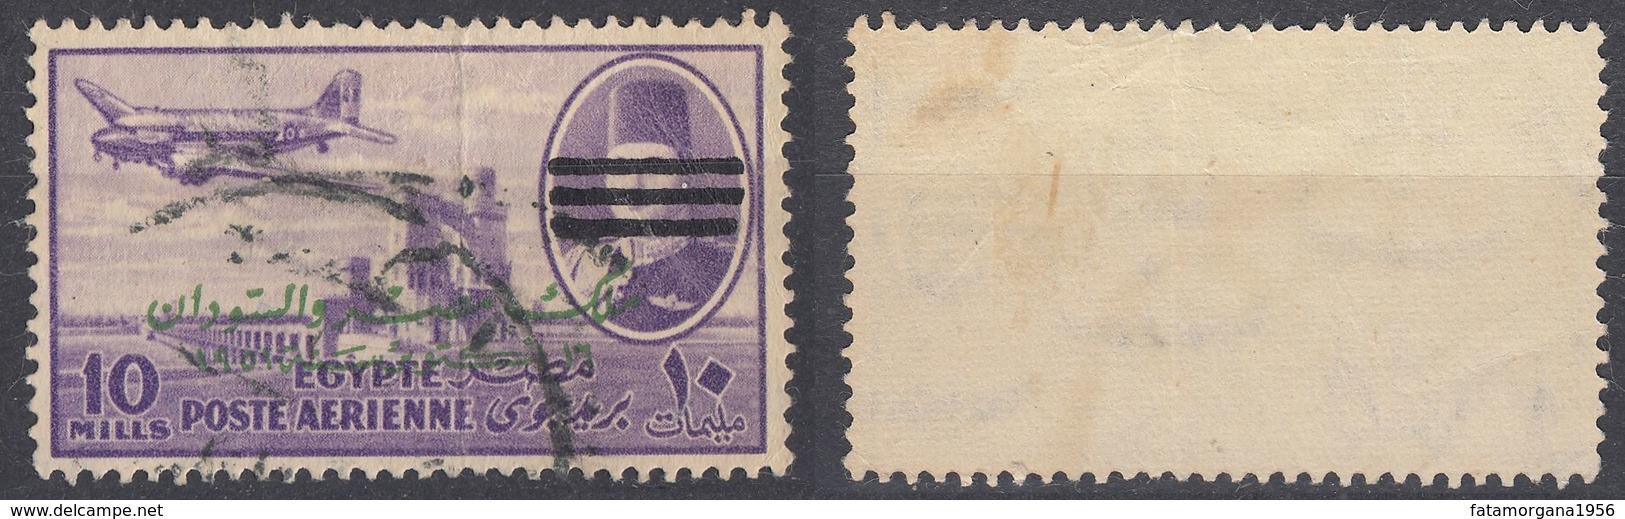 EGITTO - 1953 - Posta Aerea: Yvert 62 Usato Di Seconda Scelta. - Poste Aérienne